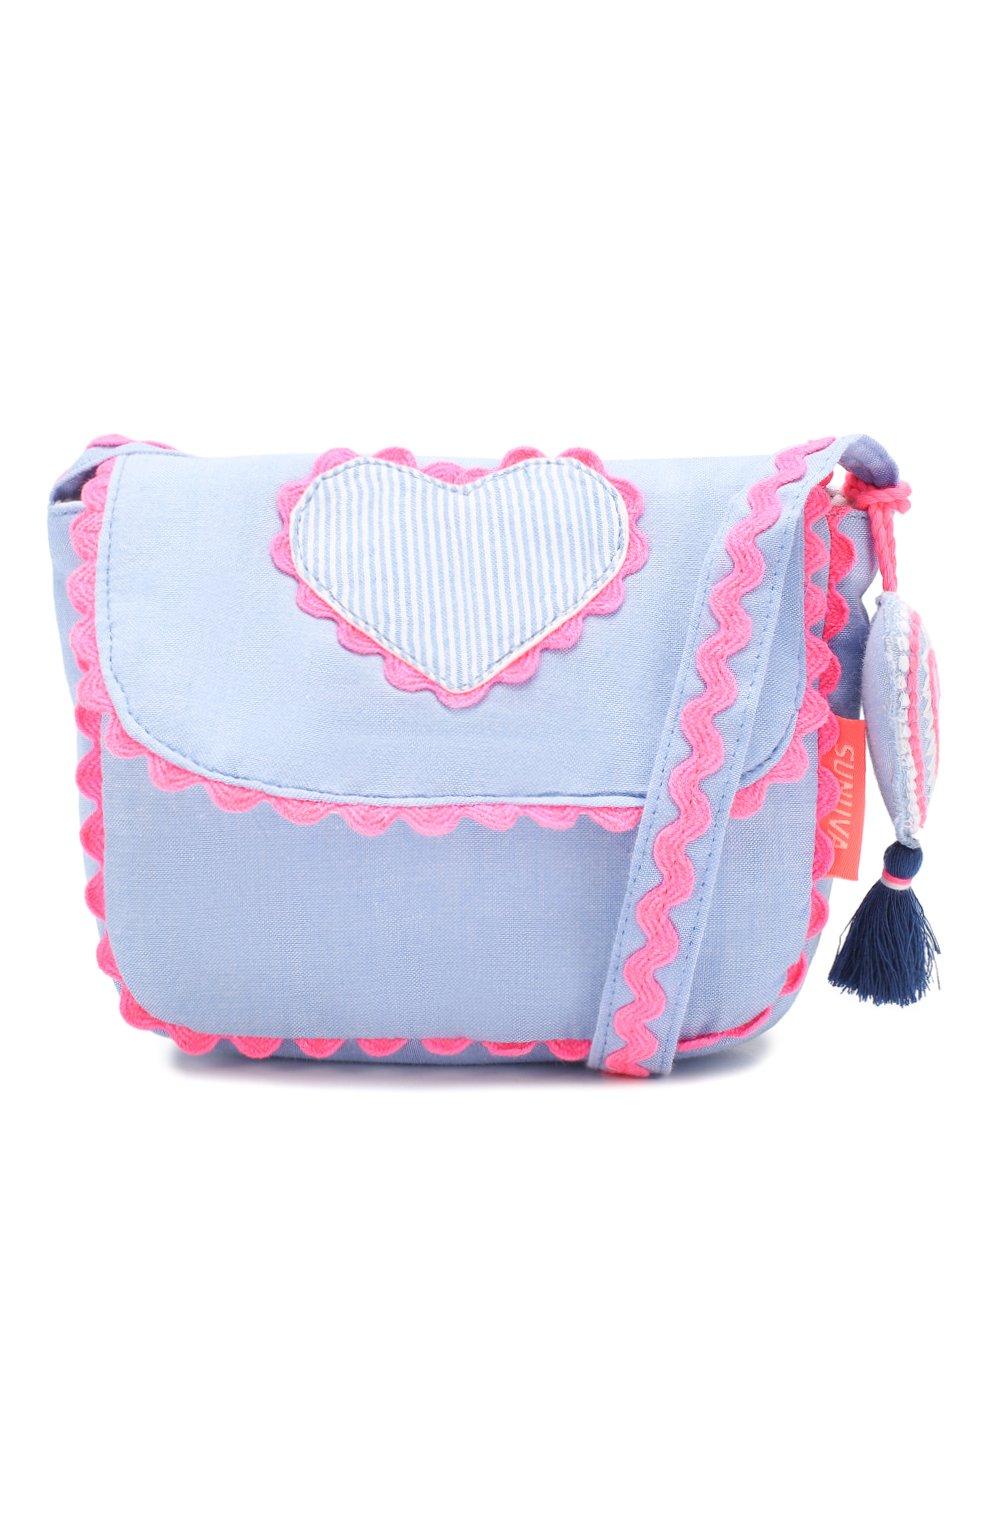 Текстильная сумка | Фото №4